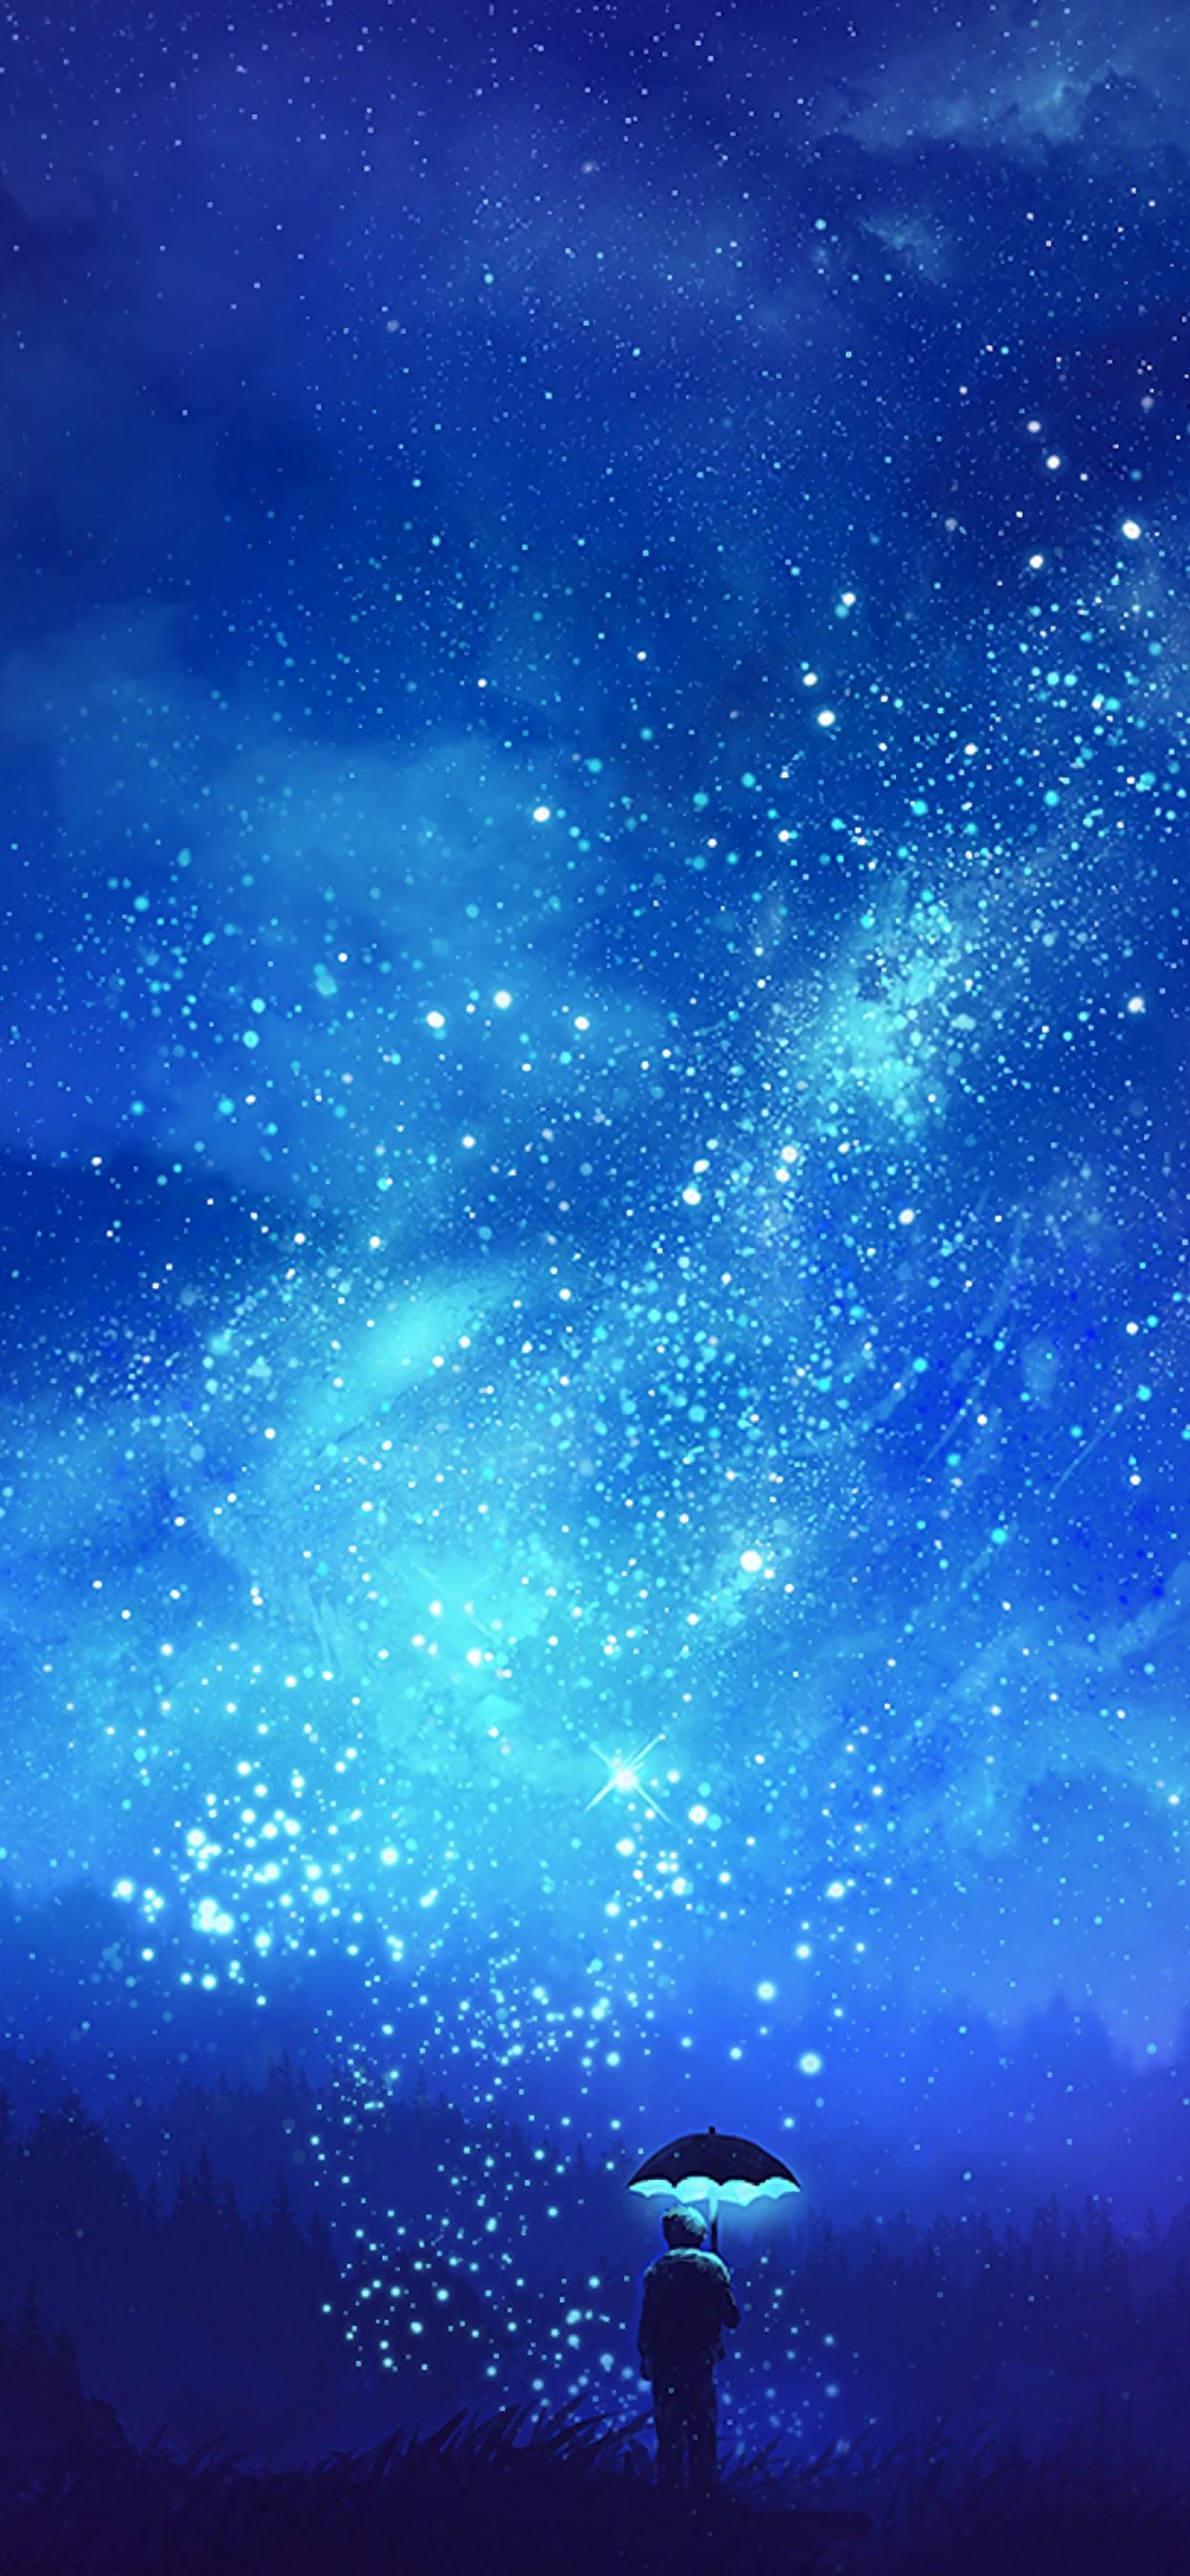 Night Sky Stars Scenery Anime 4k Wallpaper 123